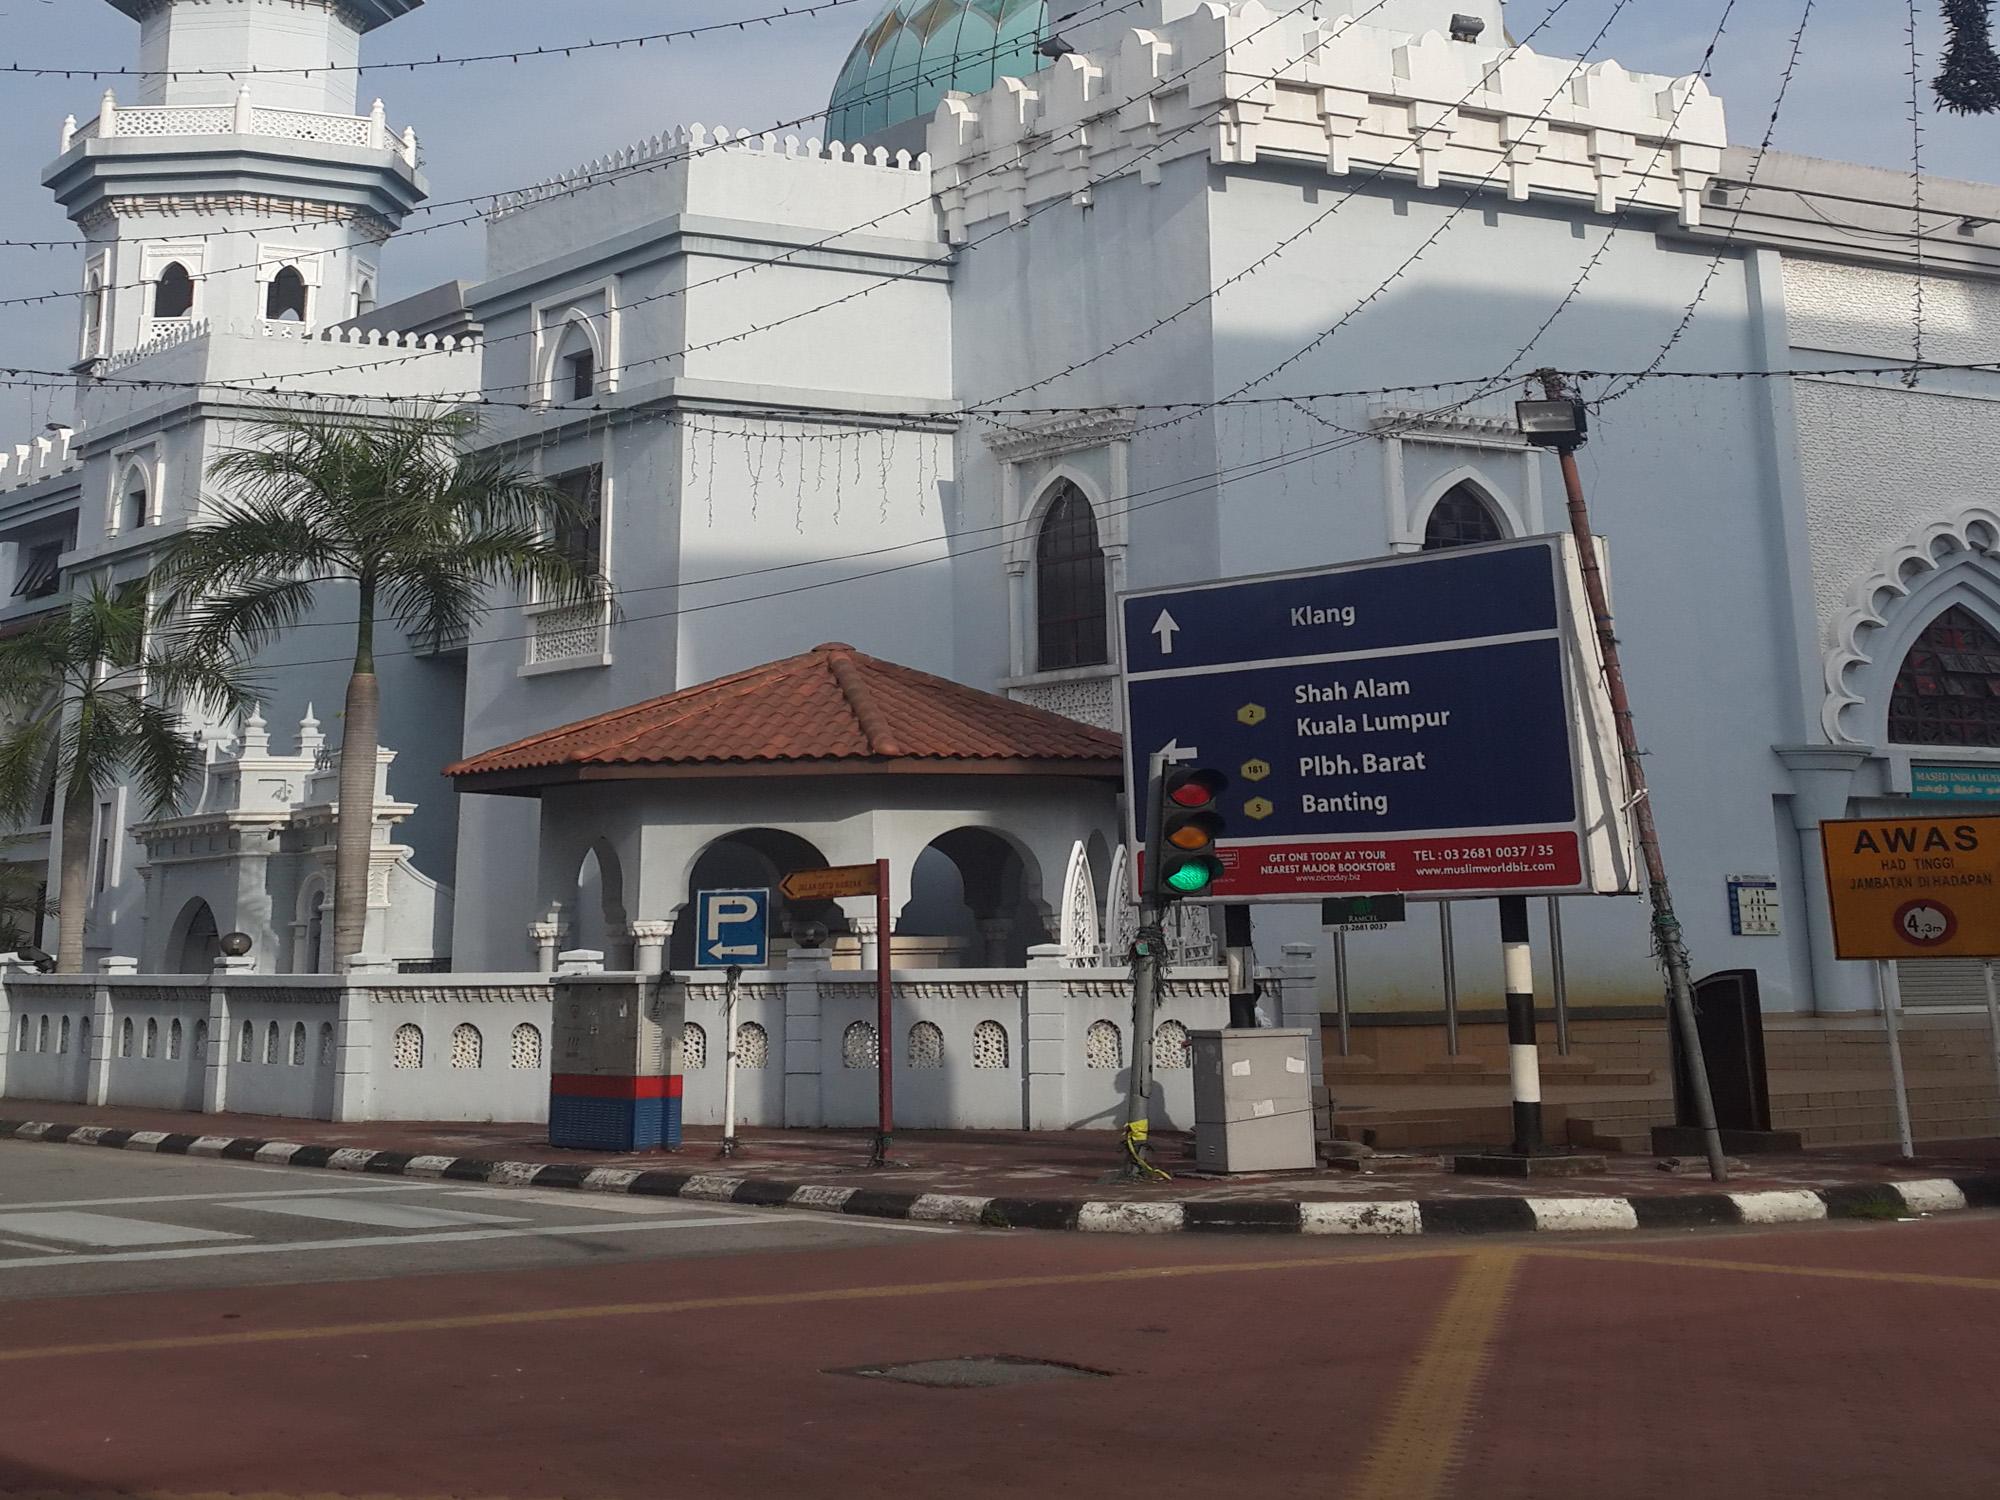 Kuala Lumpur - kuala lumpur cycling tour - Kuala Lumpur Paket Tour Murah, YOEXPLORE